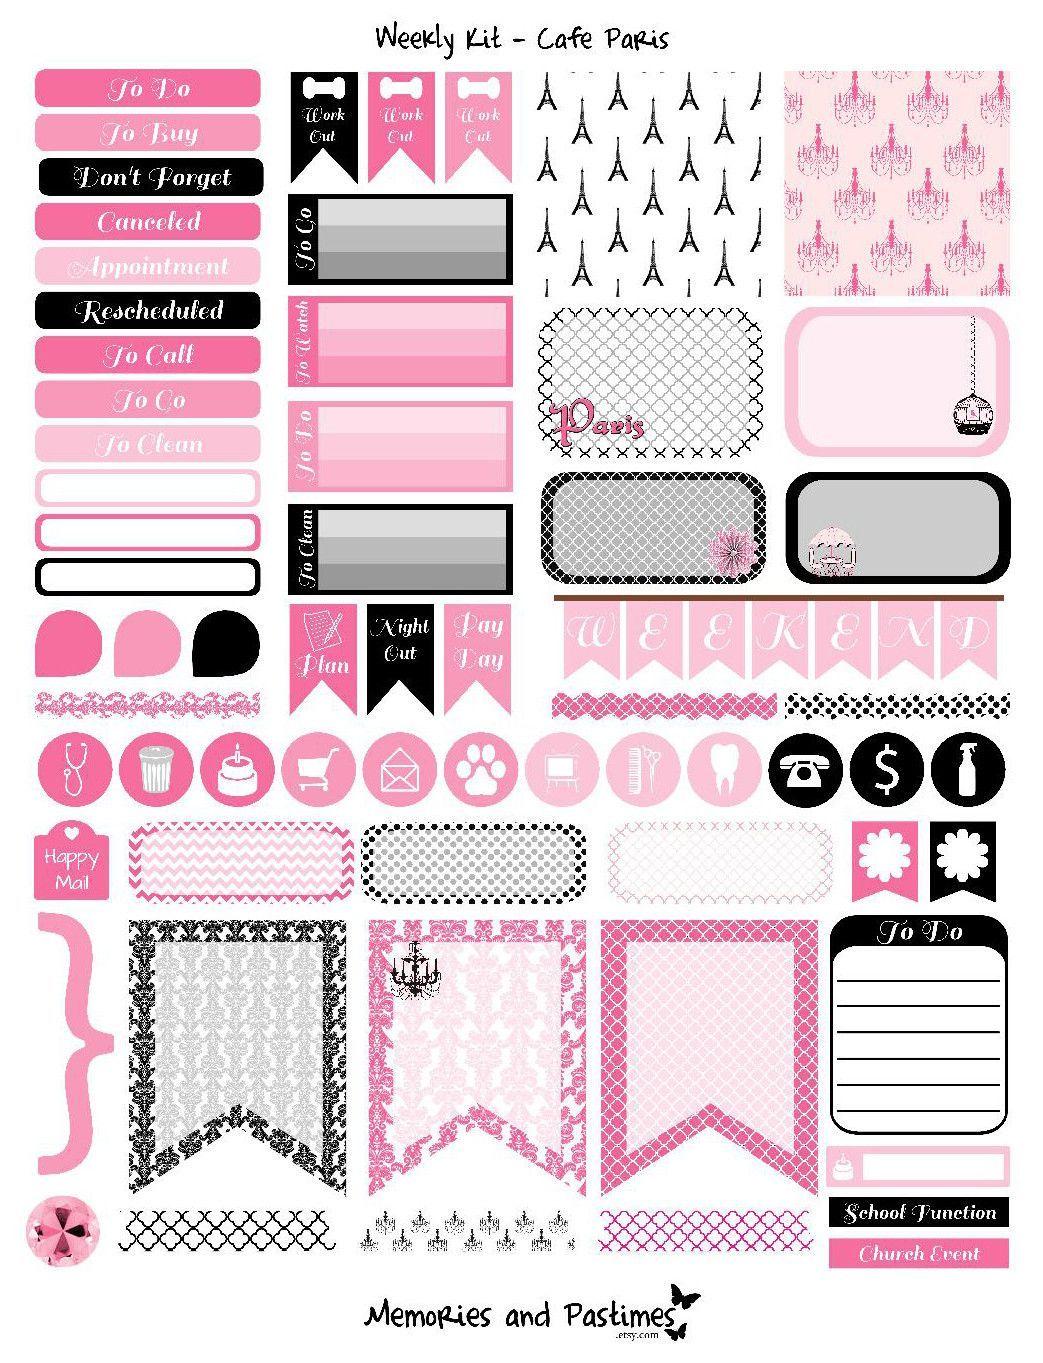 weekly kit planner sticker set - cafe paris | filofax